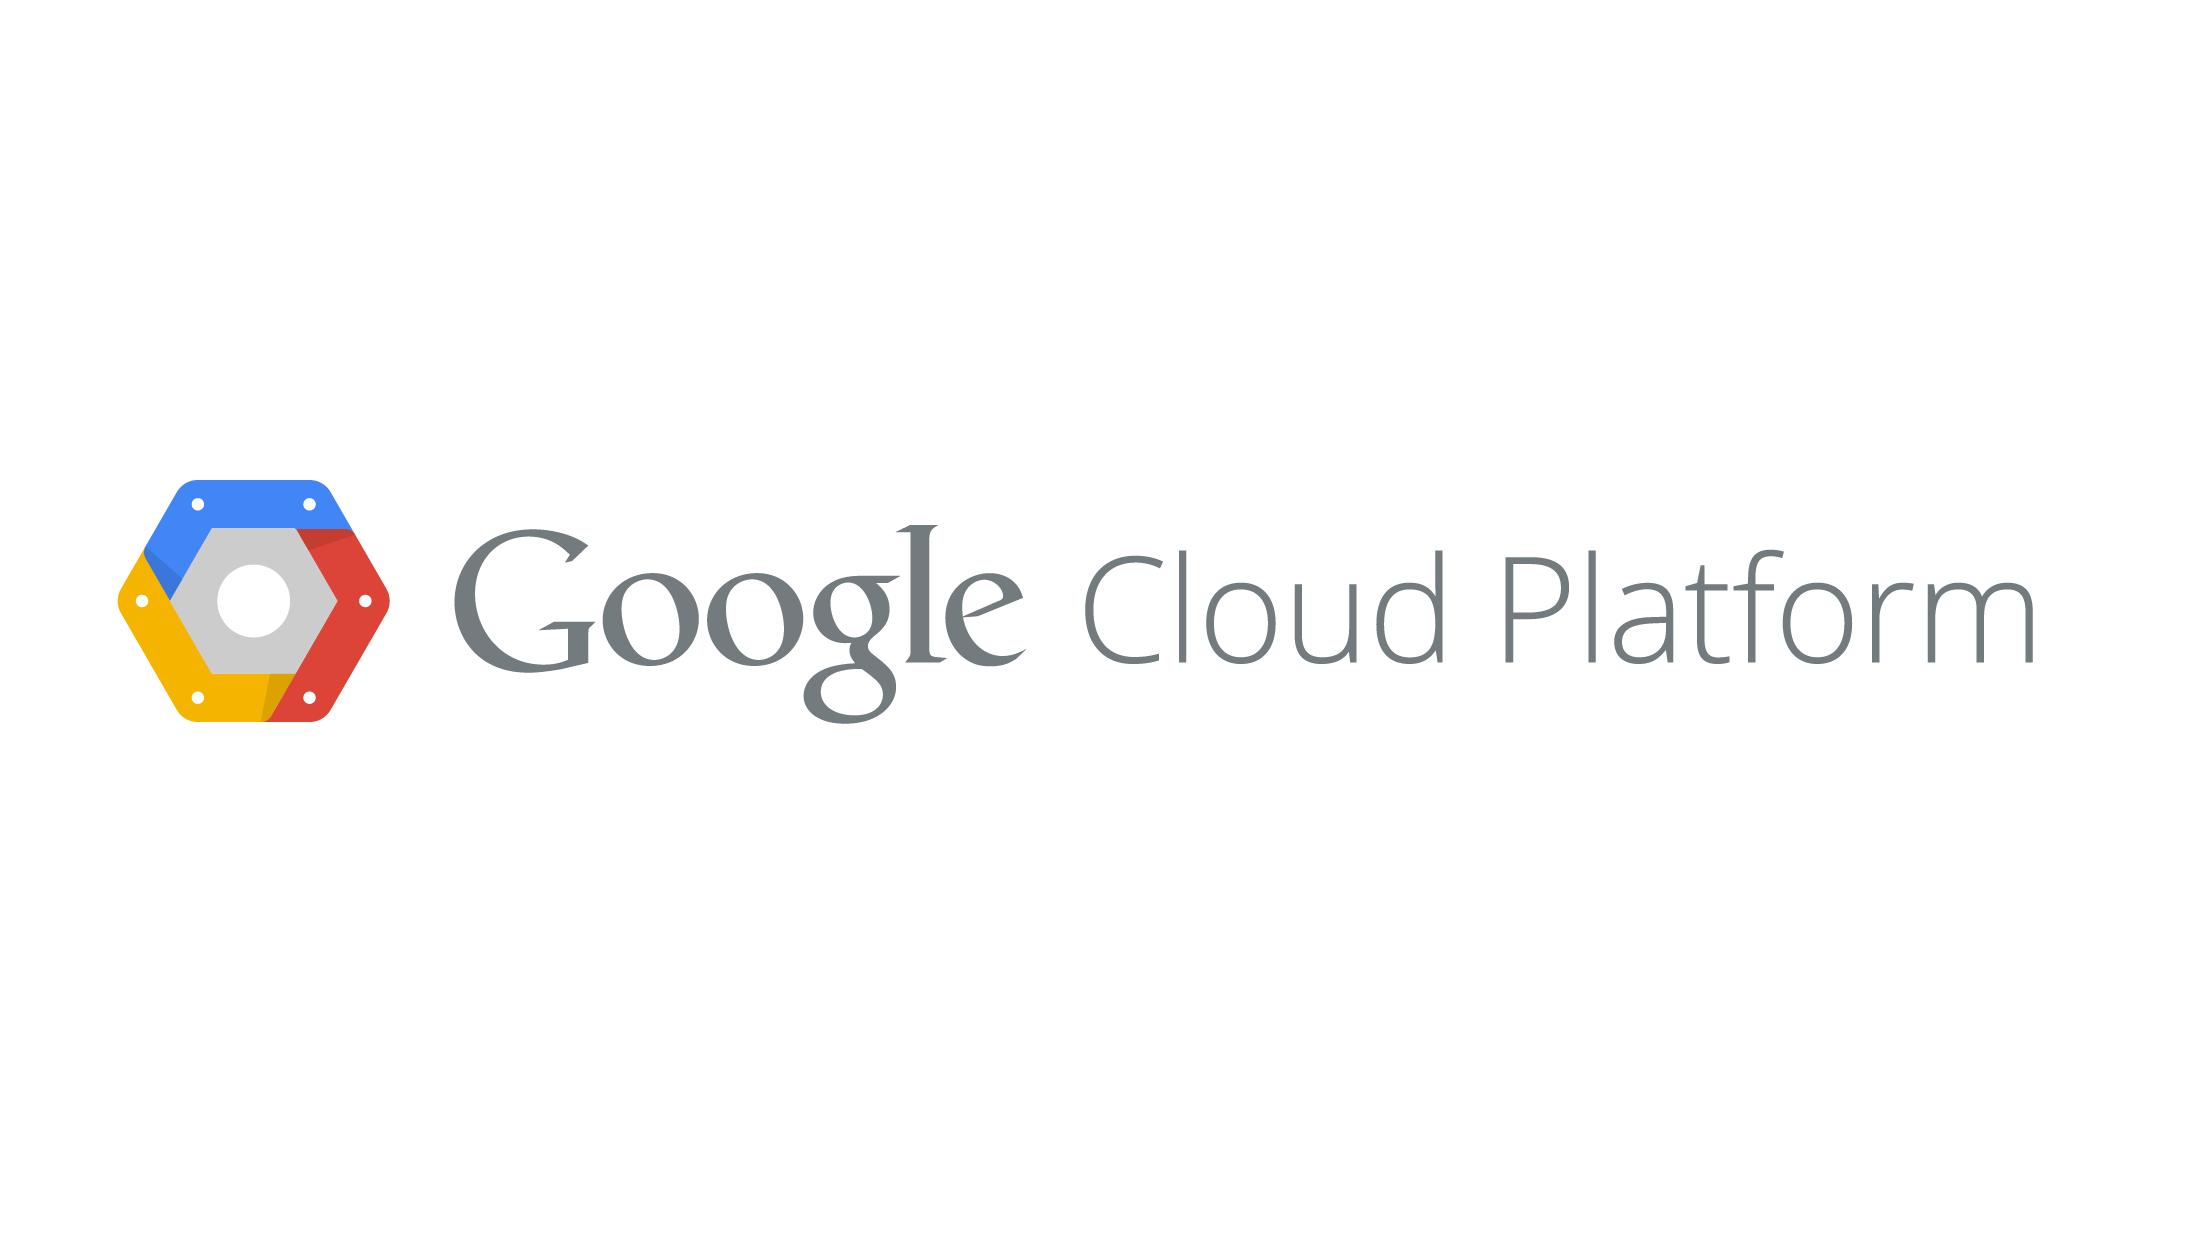 google-cloud-platform-5643dc63-7